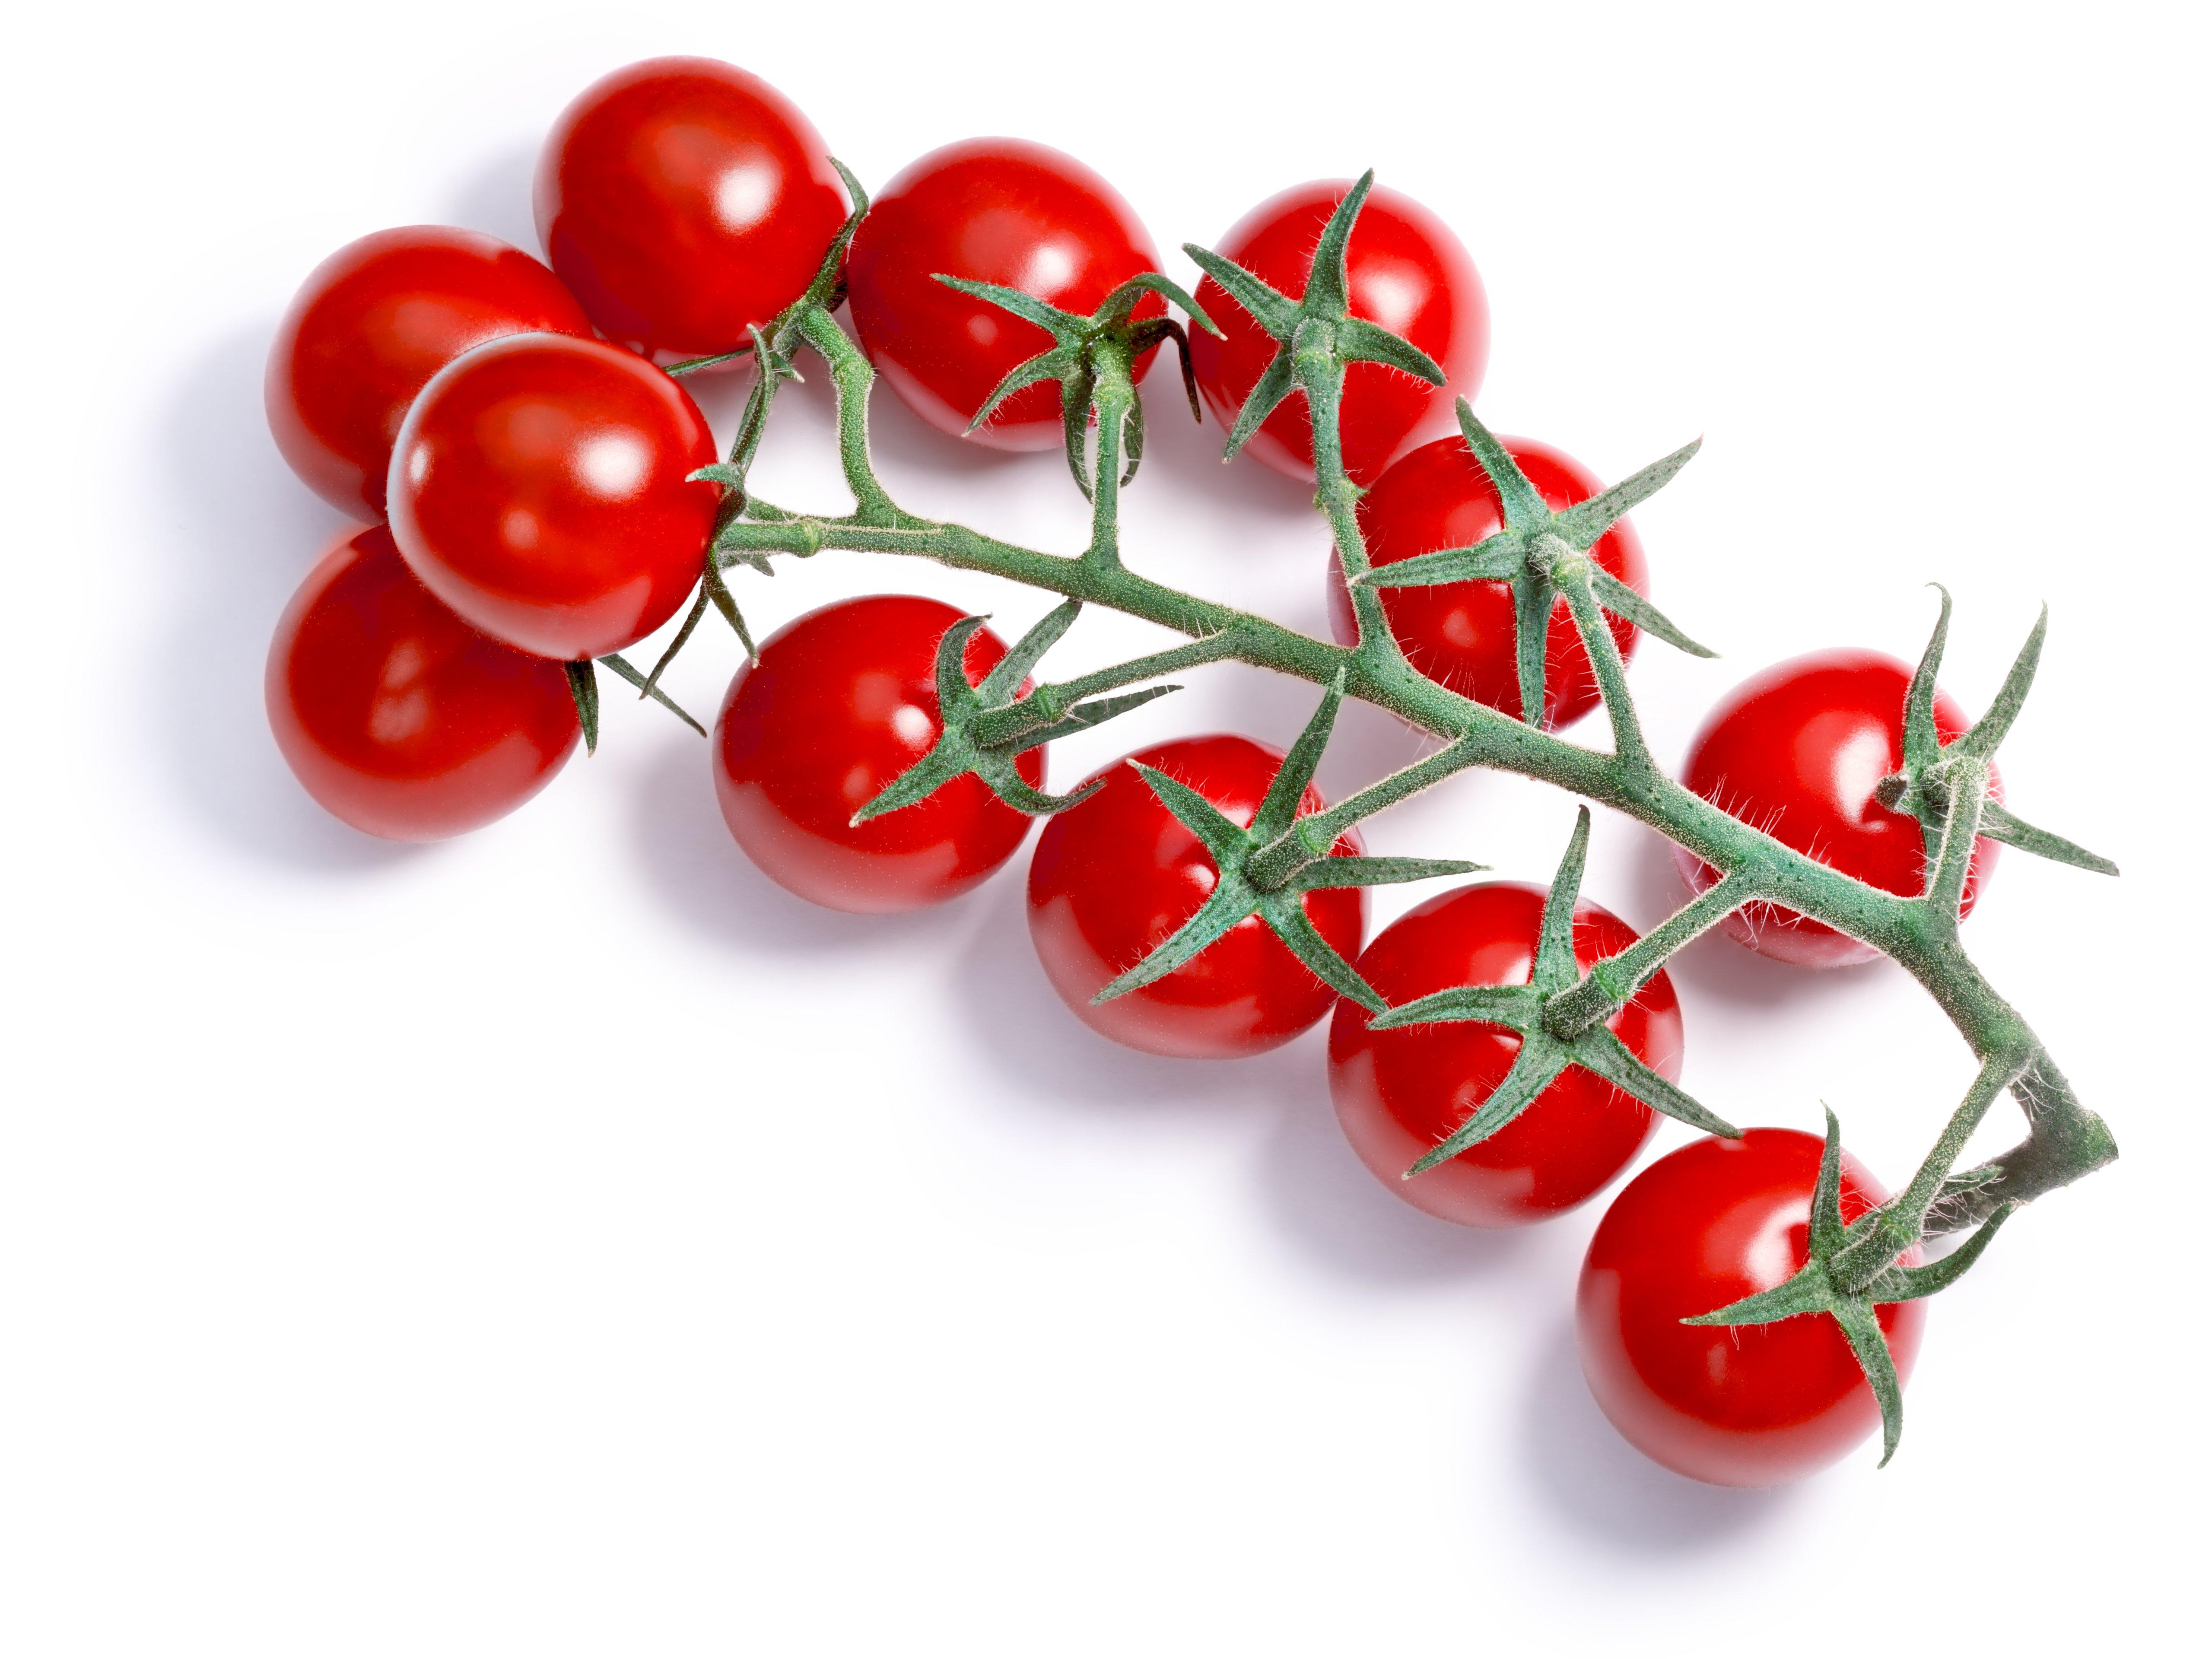 cherry tomatoes on stem